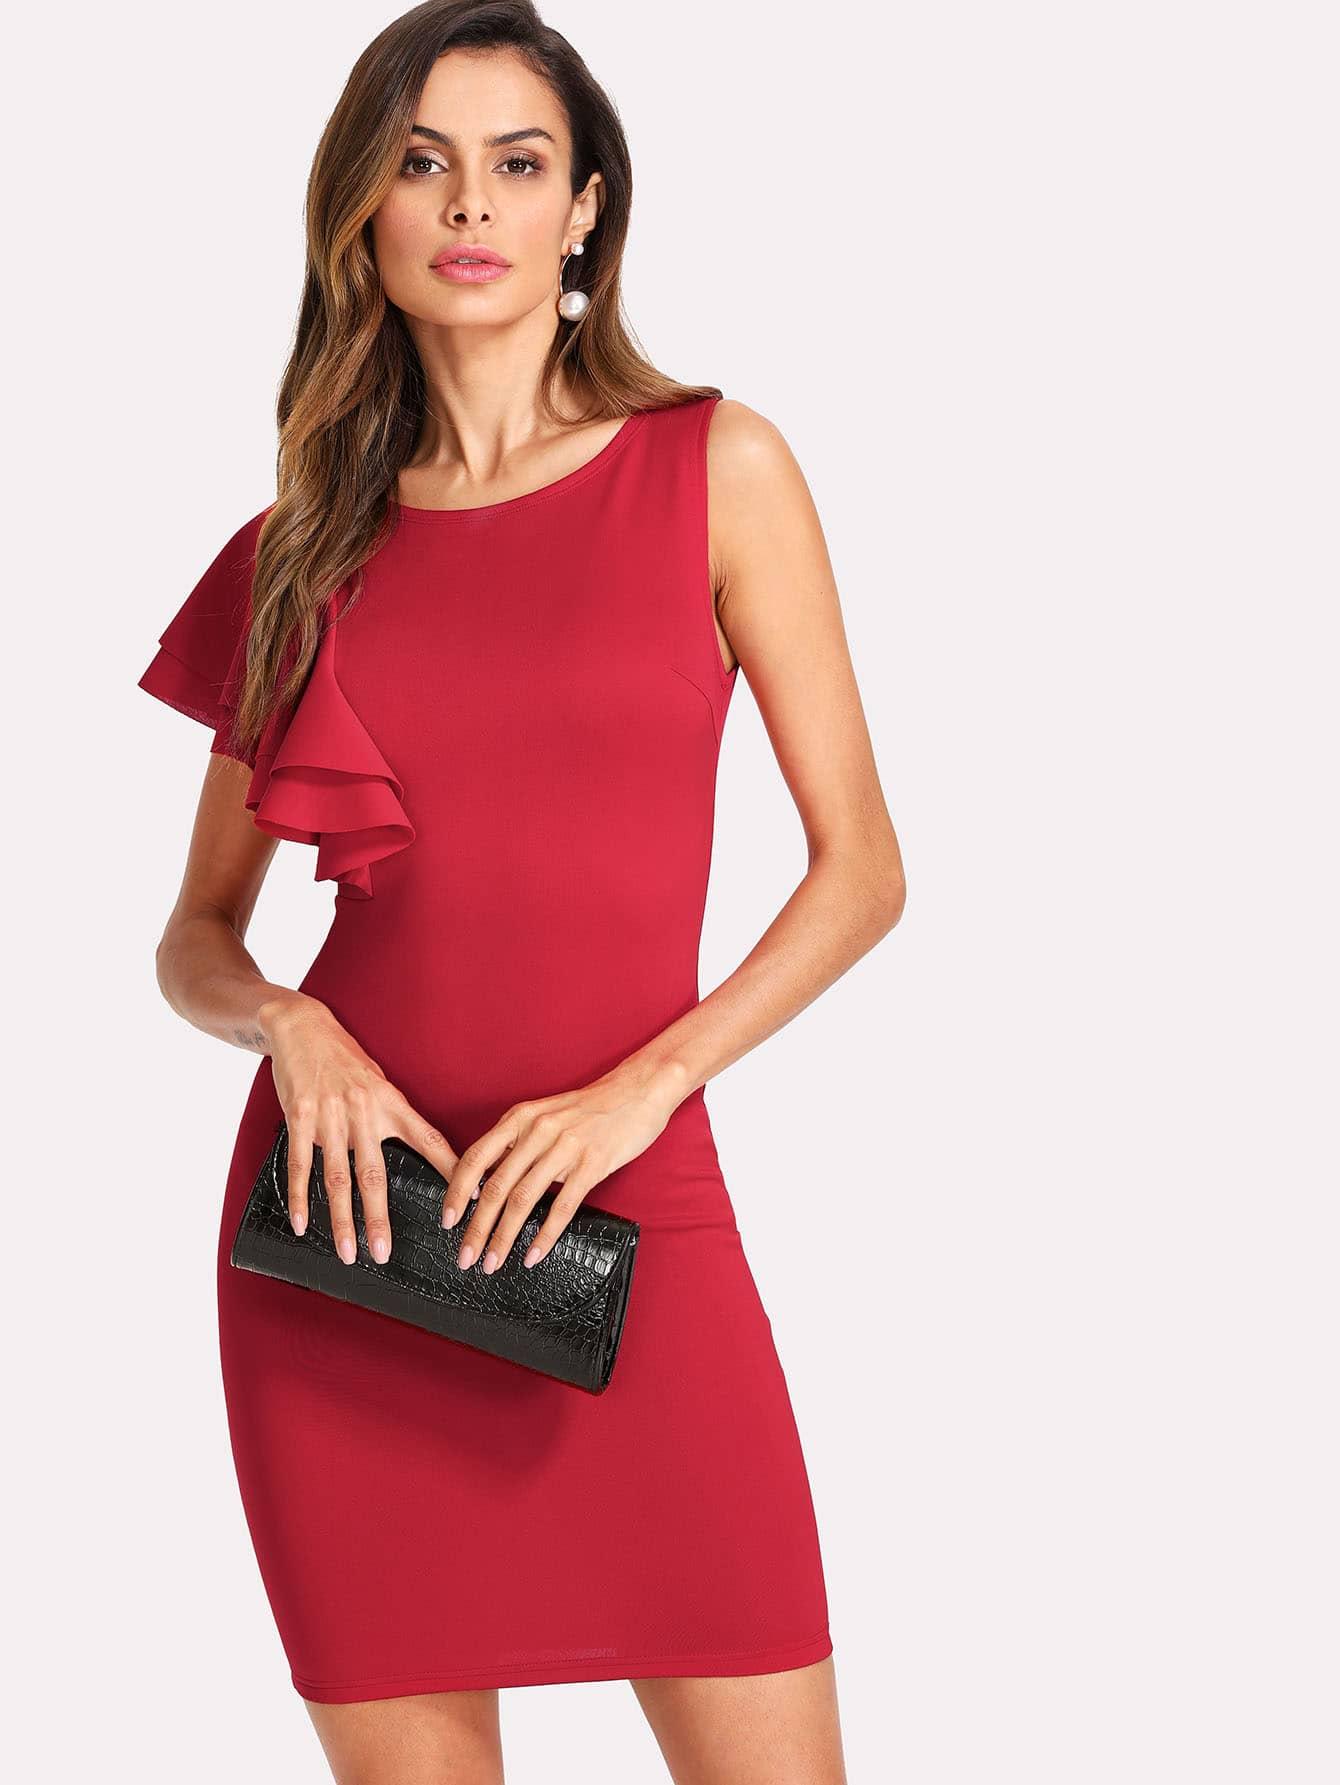 One Side Ruffle Trim Solid Dress one side ruffle trim solid dress